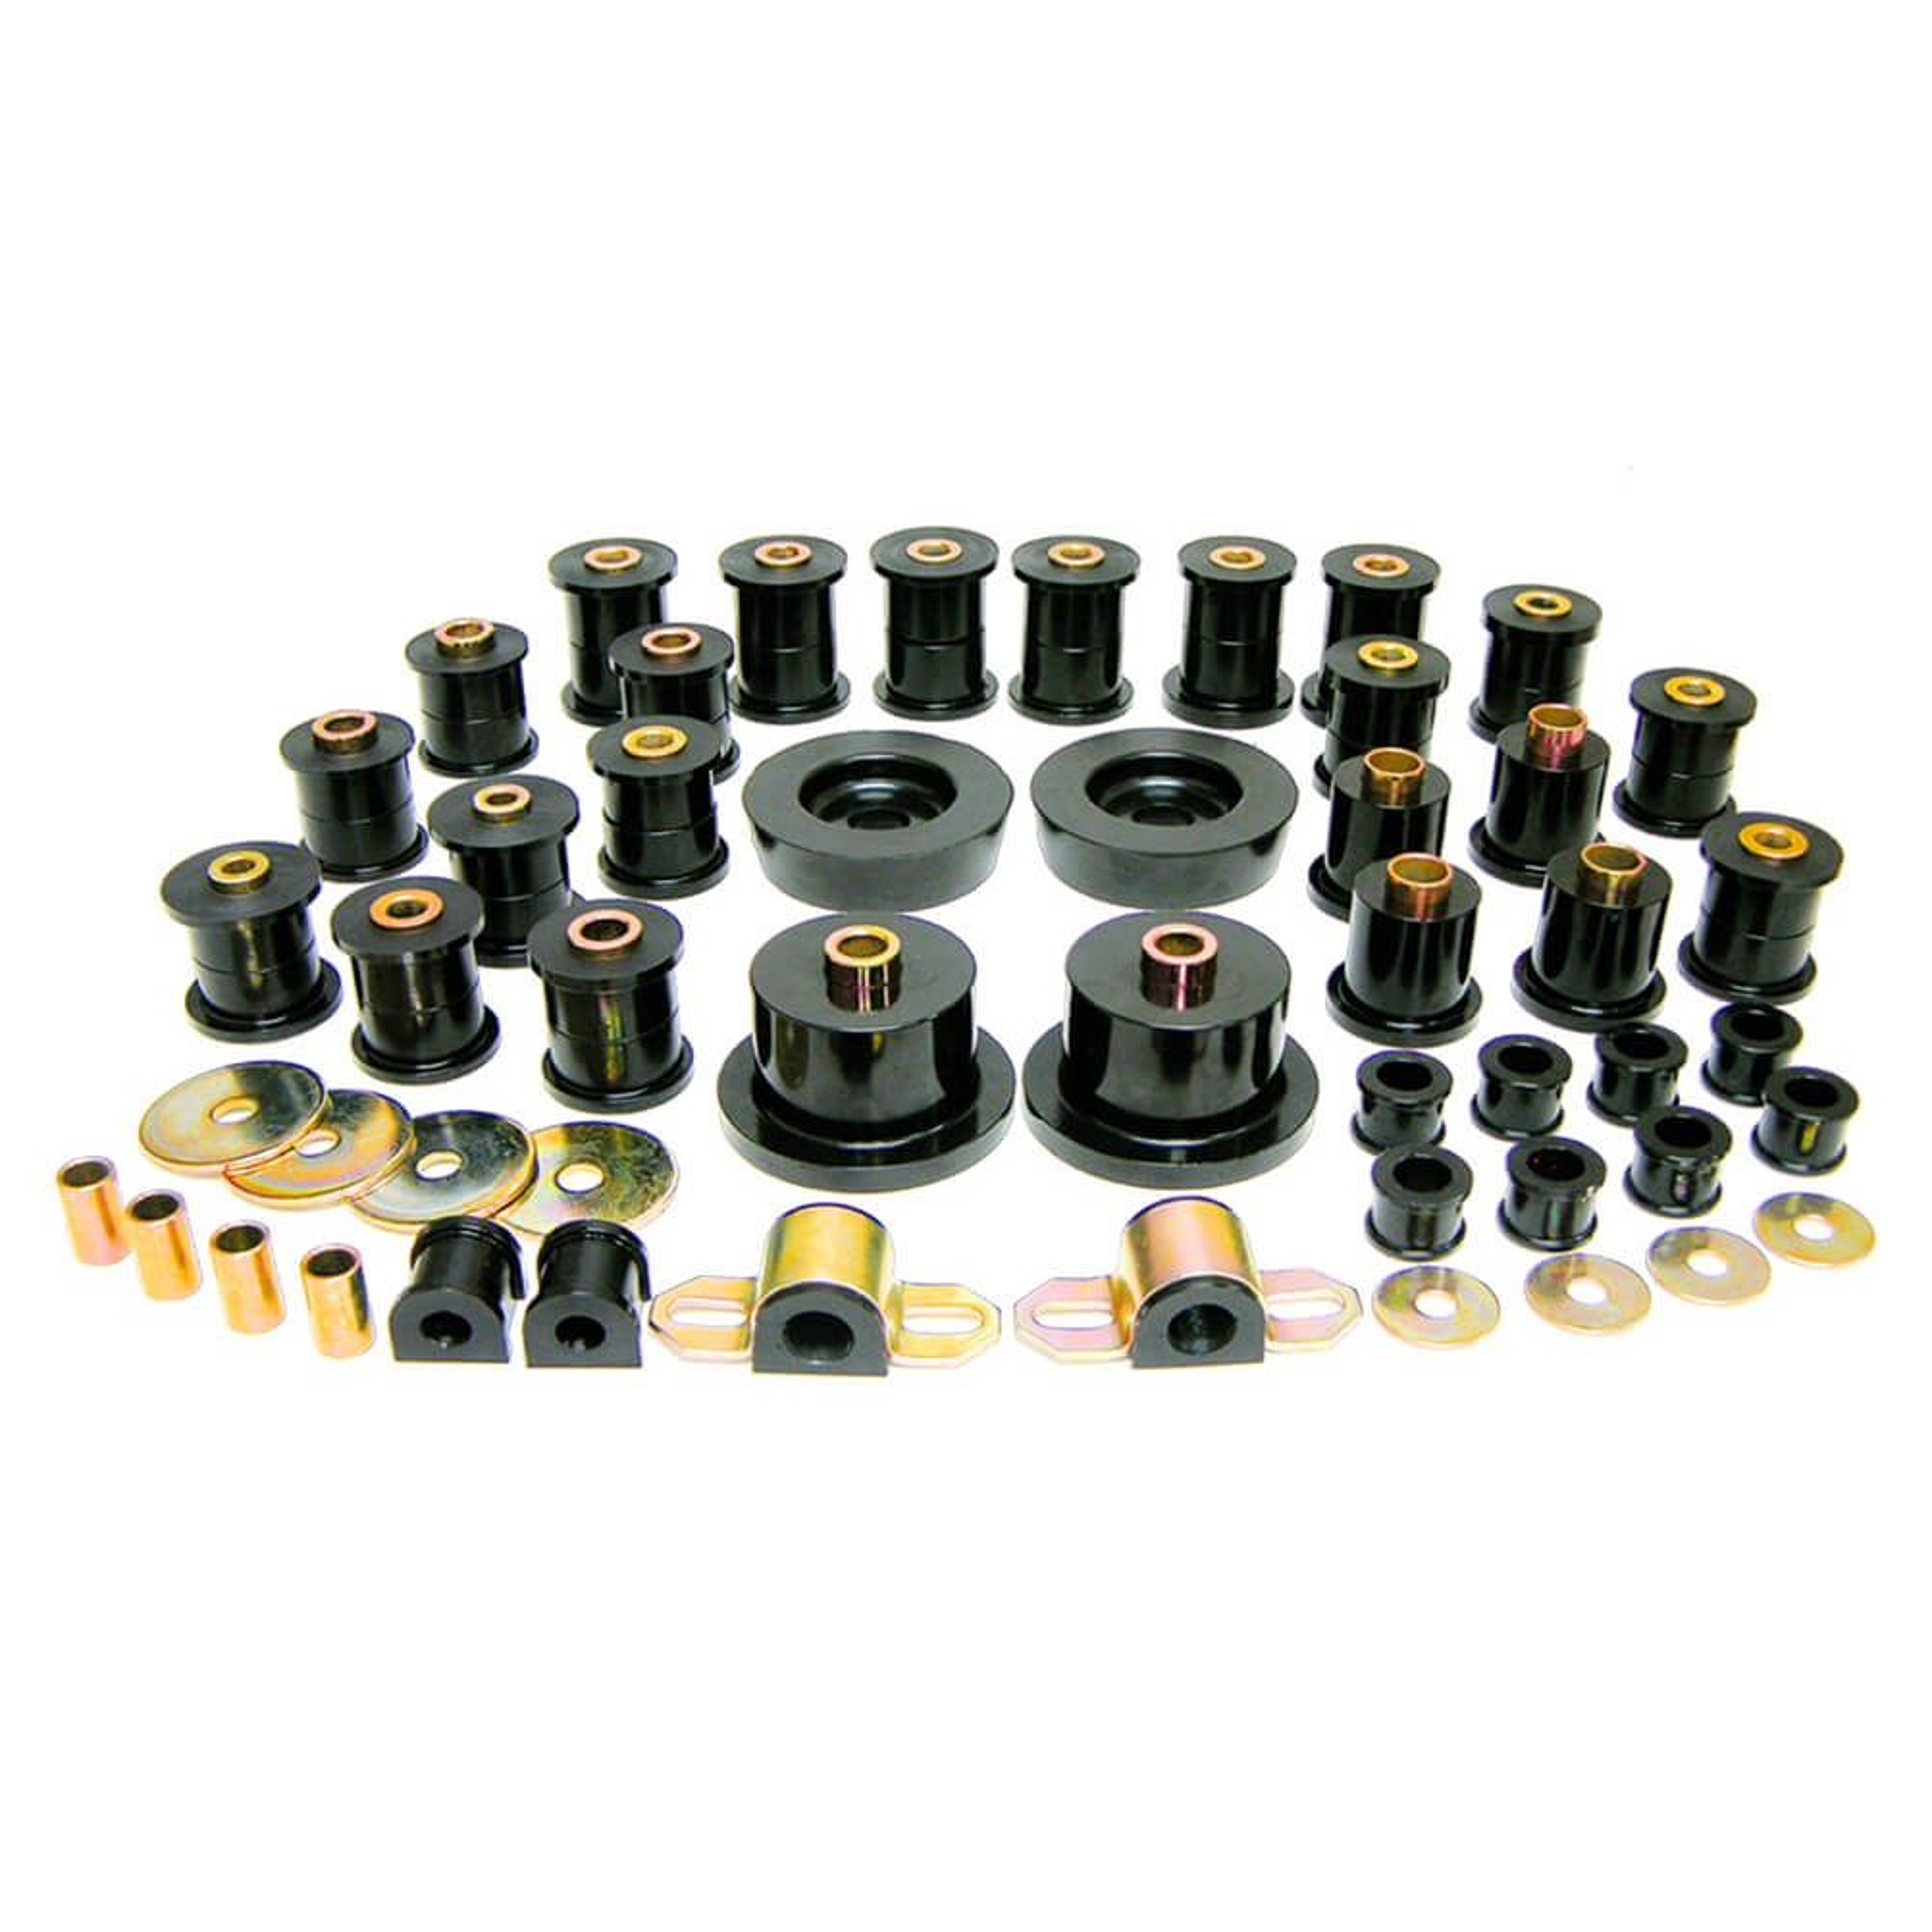 908-120 Polyurethane Bushings by Prothane - Complete Kit